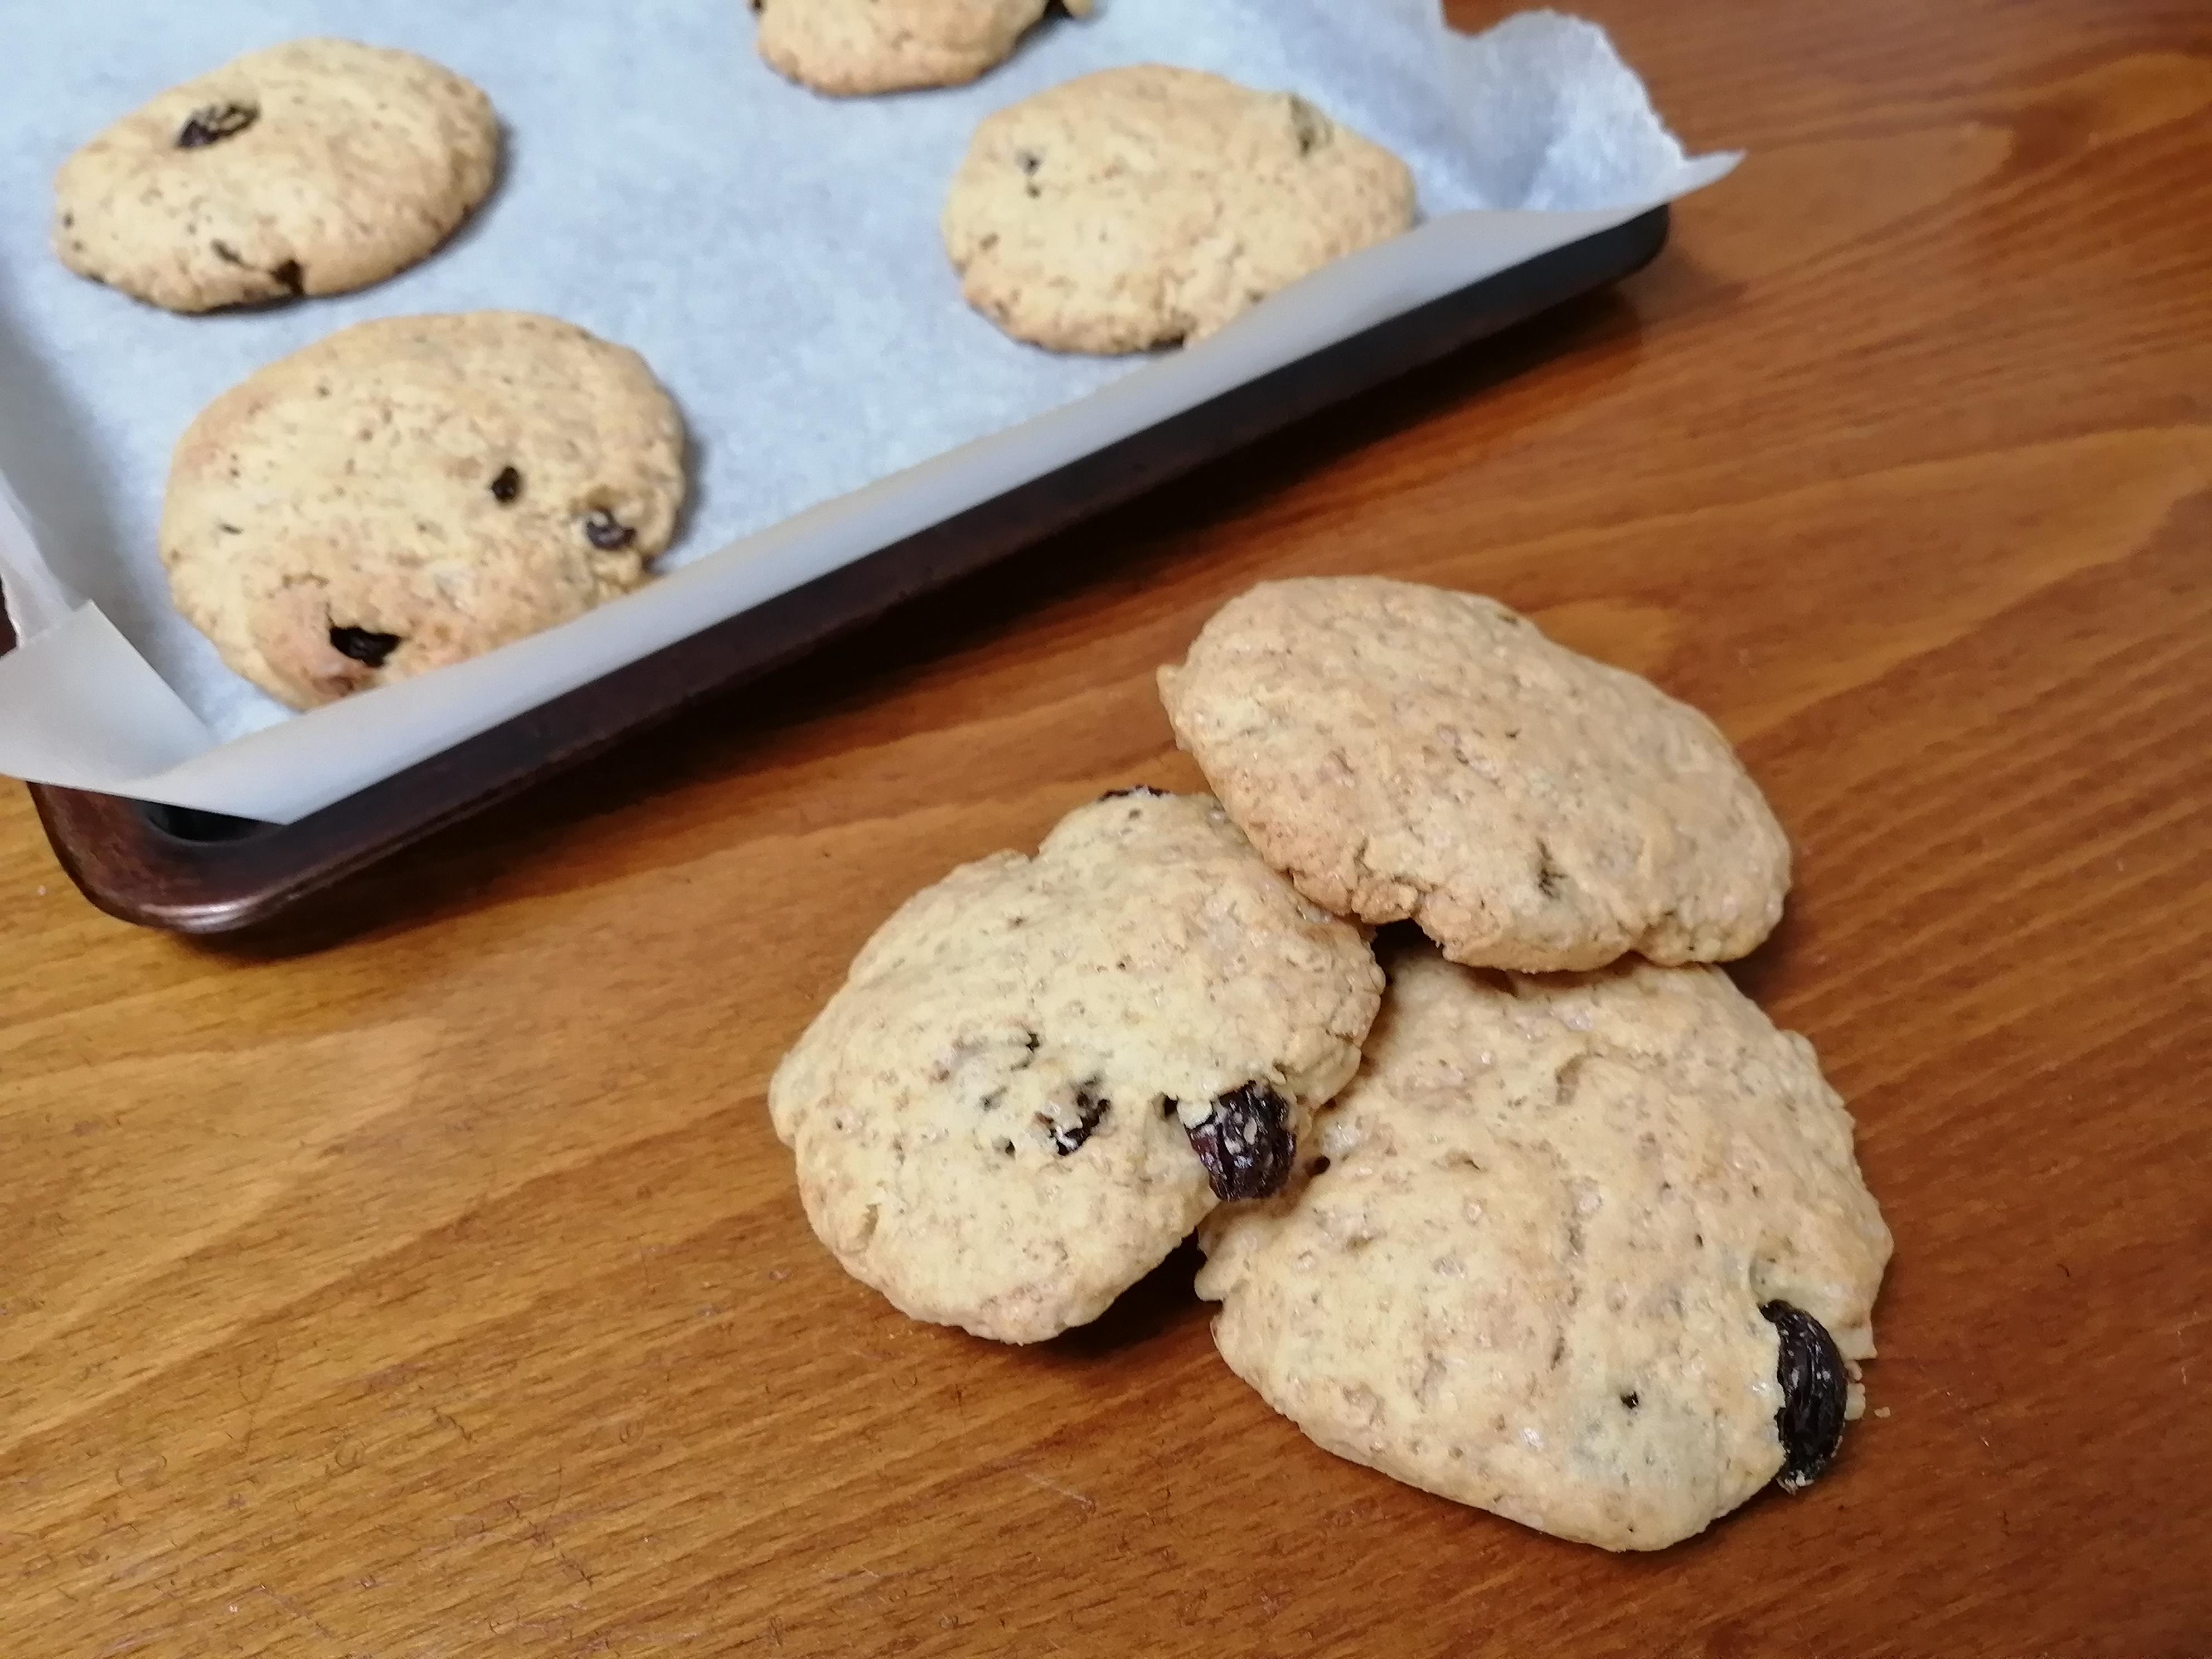 crushed-walnuts-and-raisin-cookies3